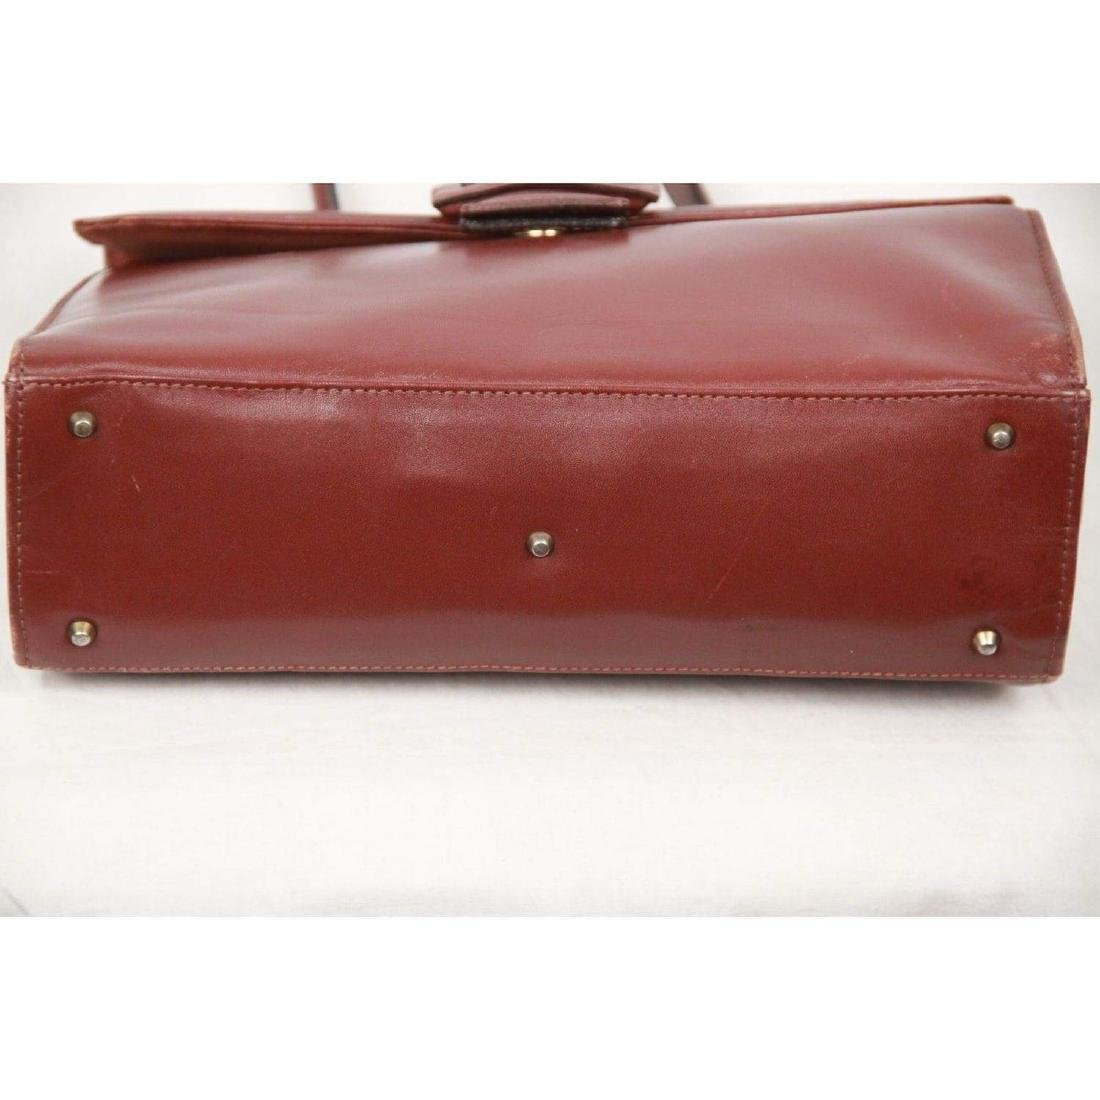 MONTENAPOLEONE Vintage Brown Leather HANDBAG - 6